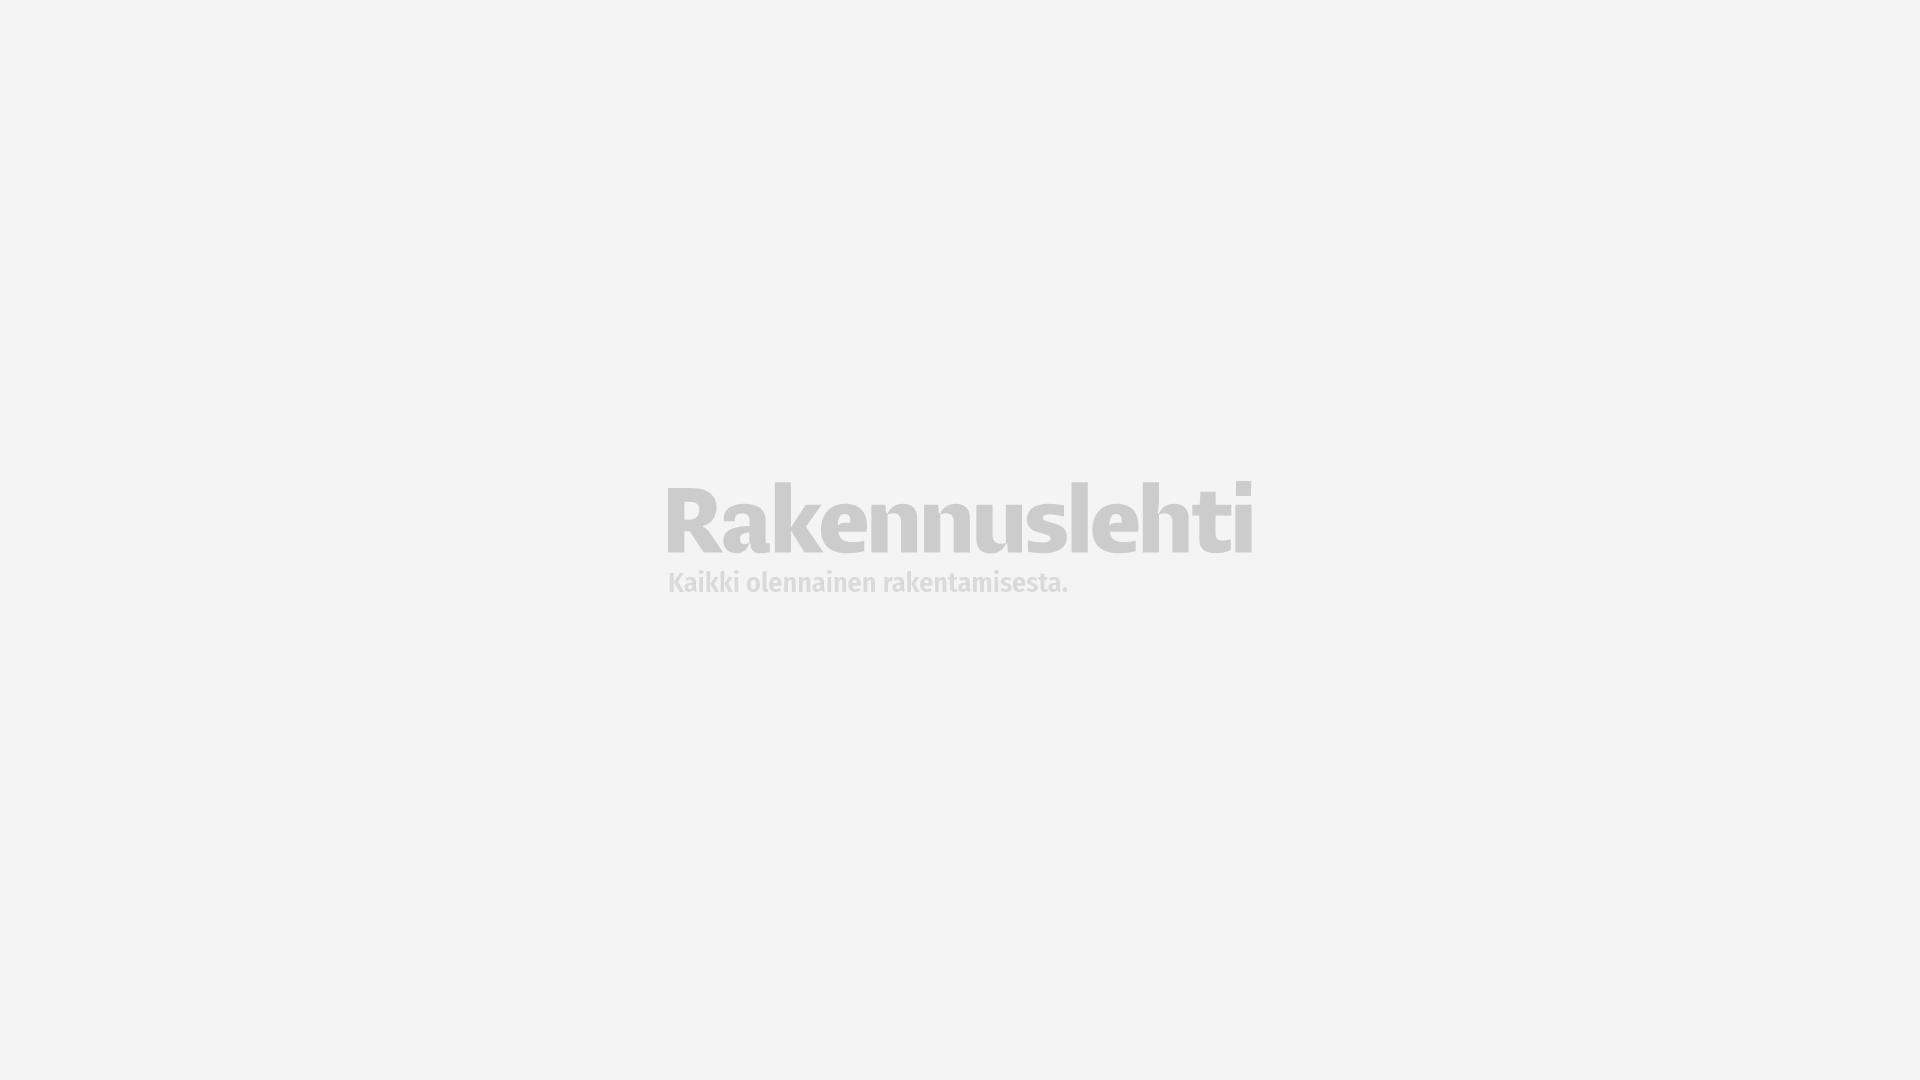 www.rakennuslehti.fi